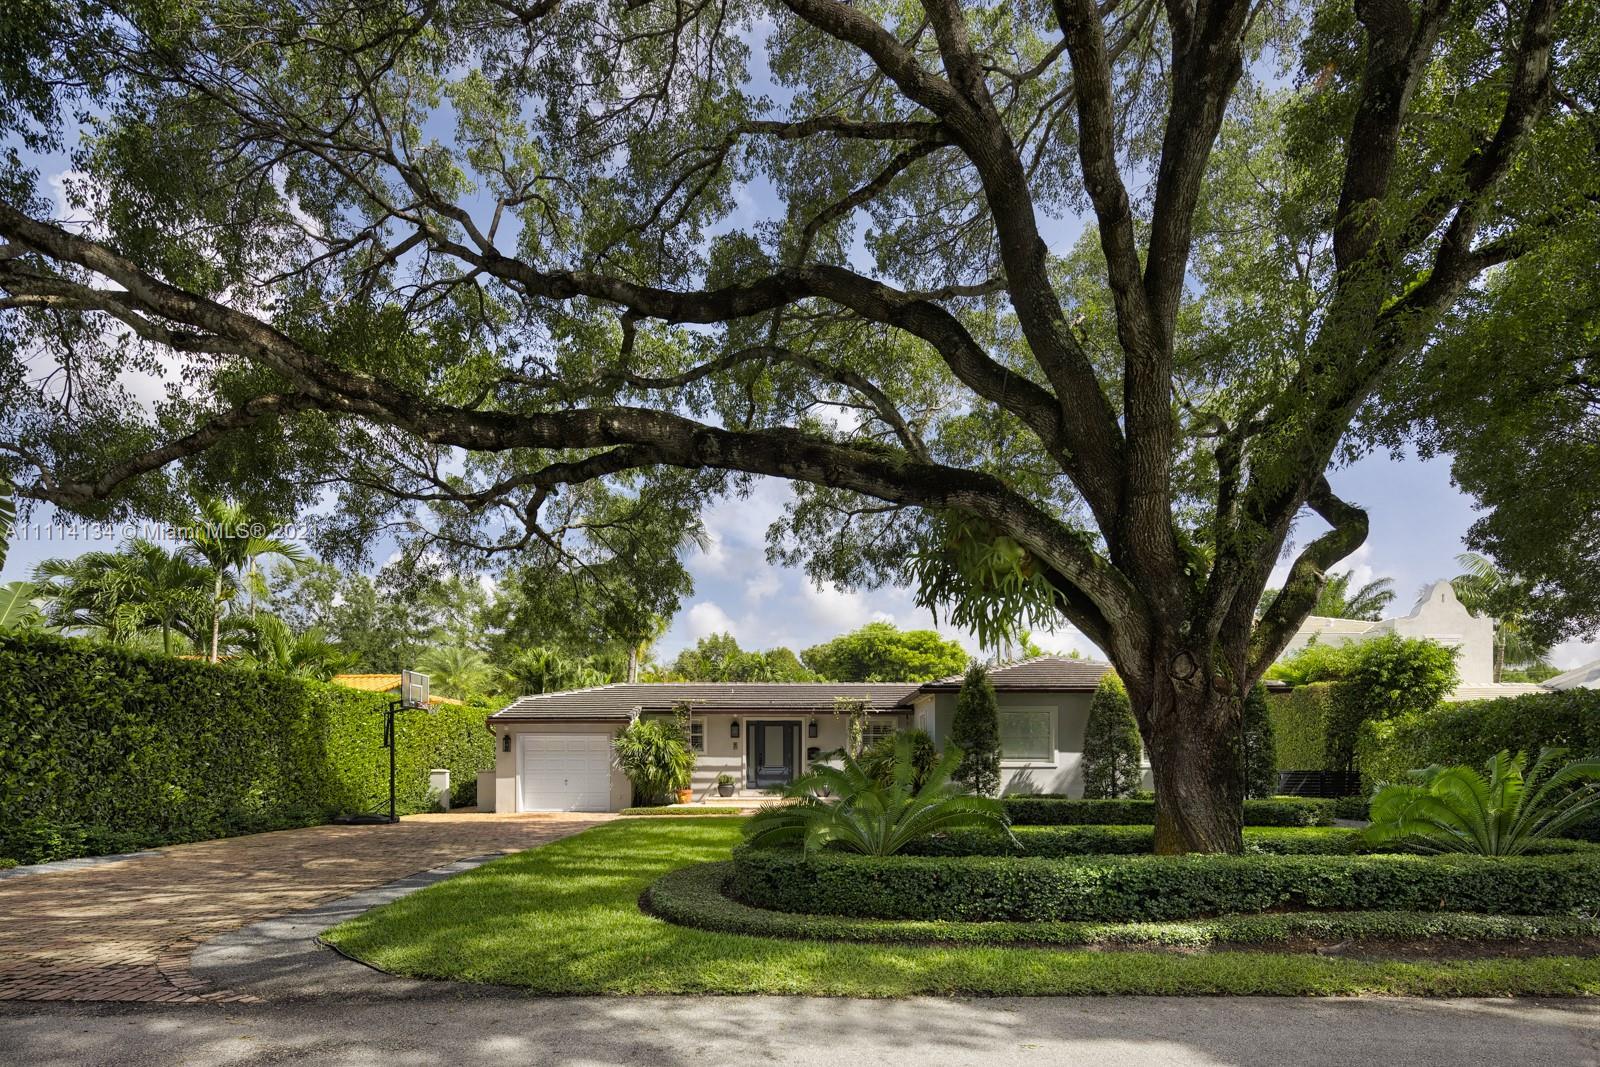 Single Family Home For Sale UNIVERSITY ESTATES2,472 Sqft